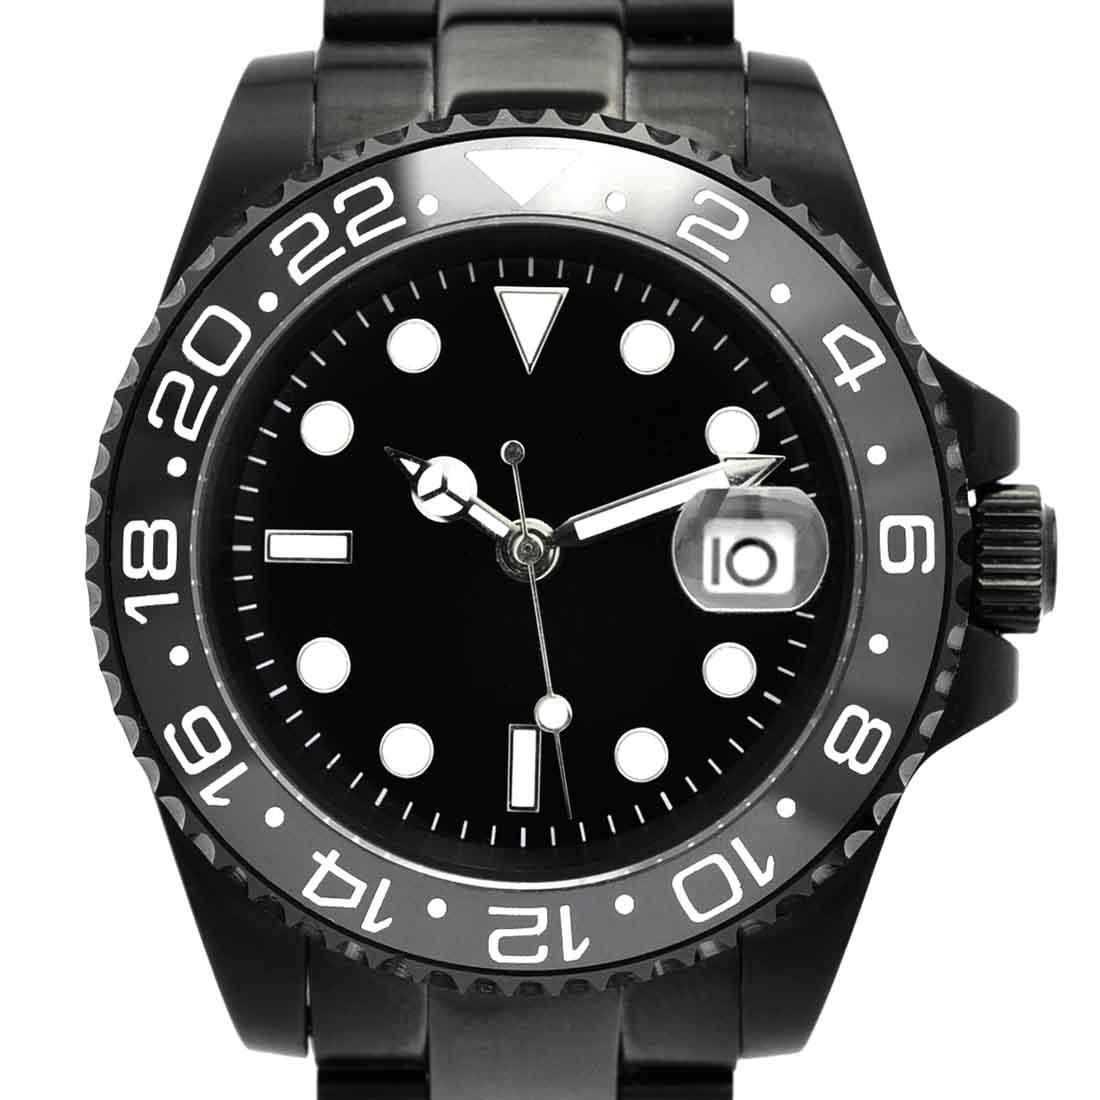 56b3aa8637 NOLOGOノーロゴ機械式腕時計自動巻オートマチックGMTマスターブラックPVD[NL-063BB4ASG